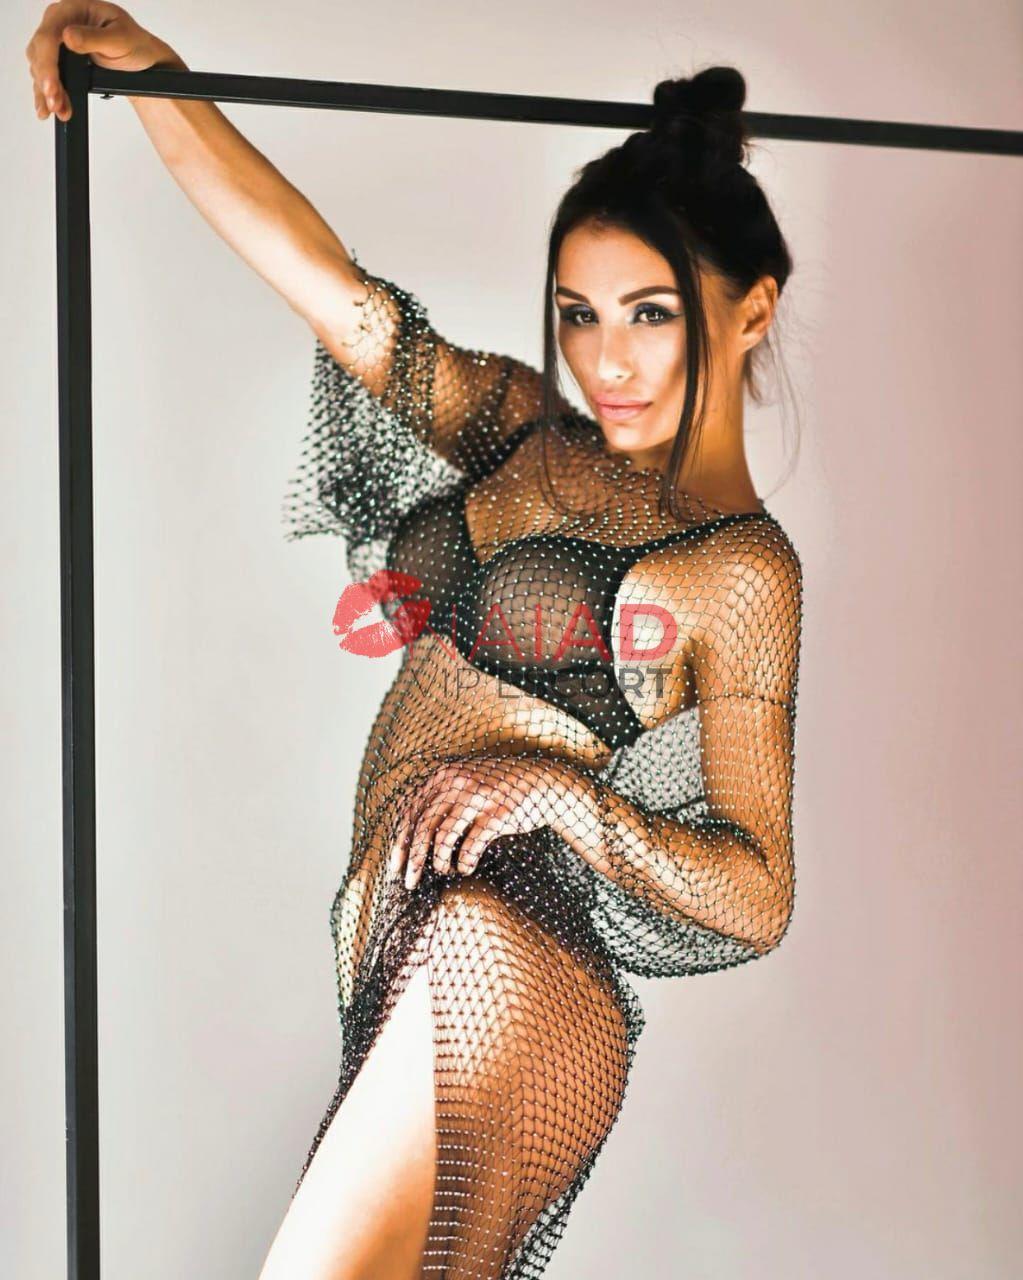 Photo of Jodi on Naiad vip escort service in Paris